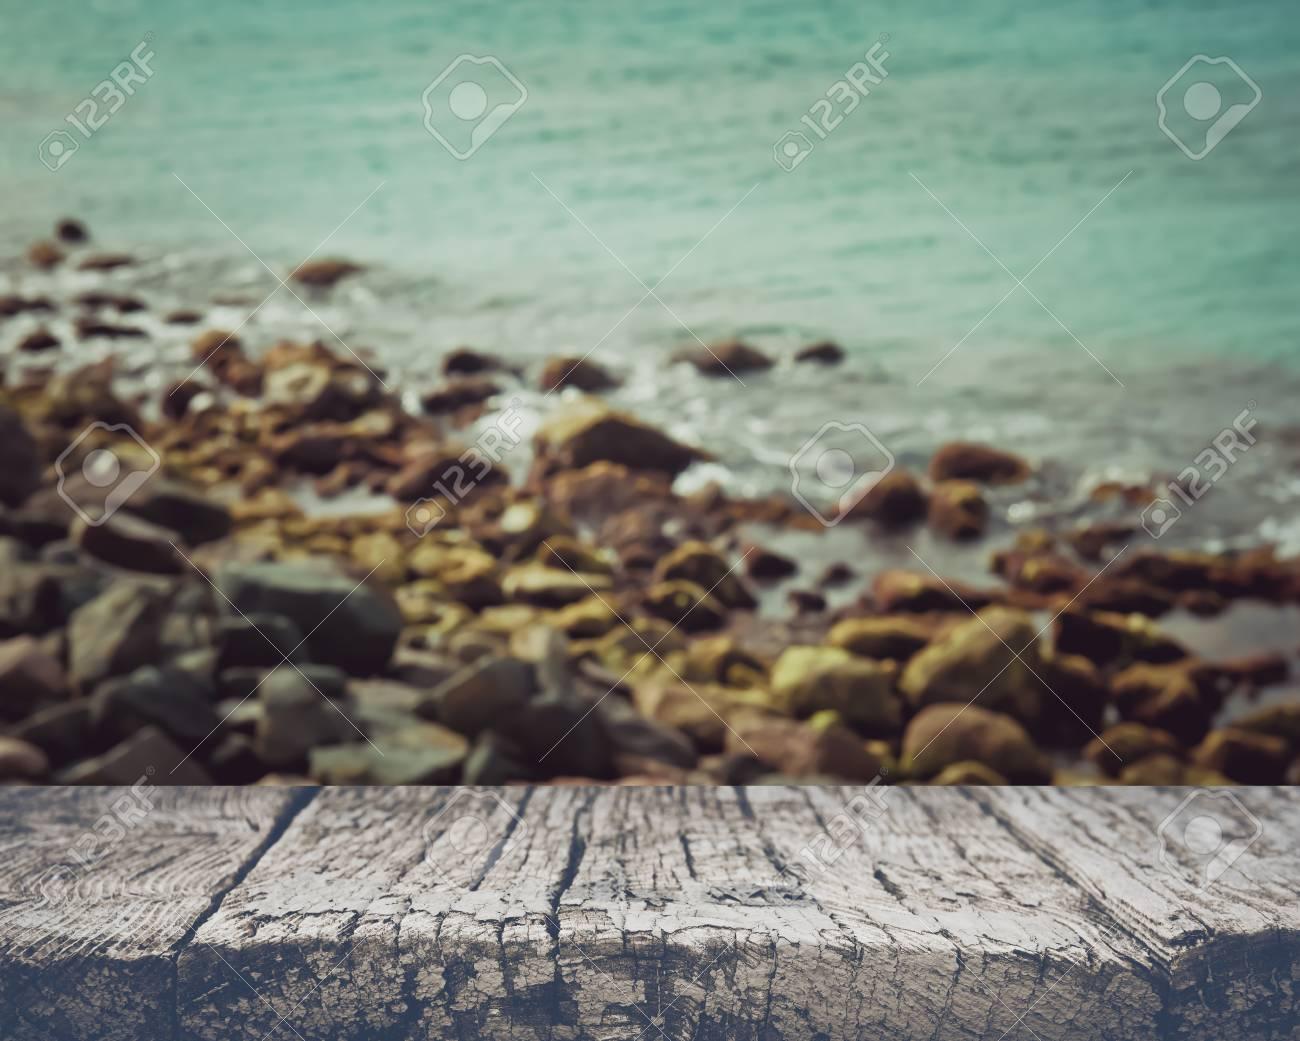 Blurred Ocean Background - 55008025